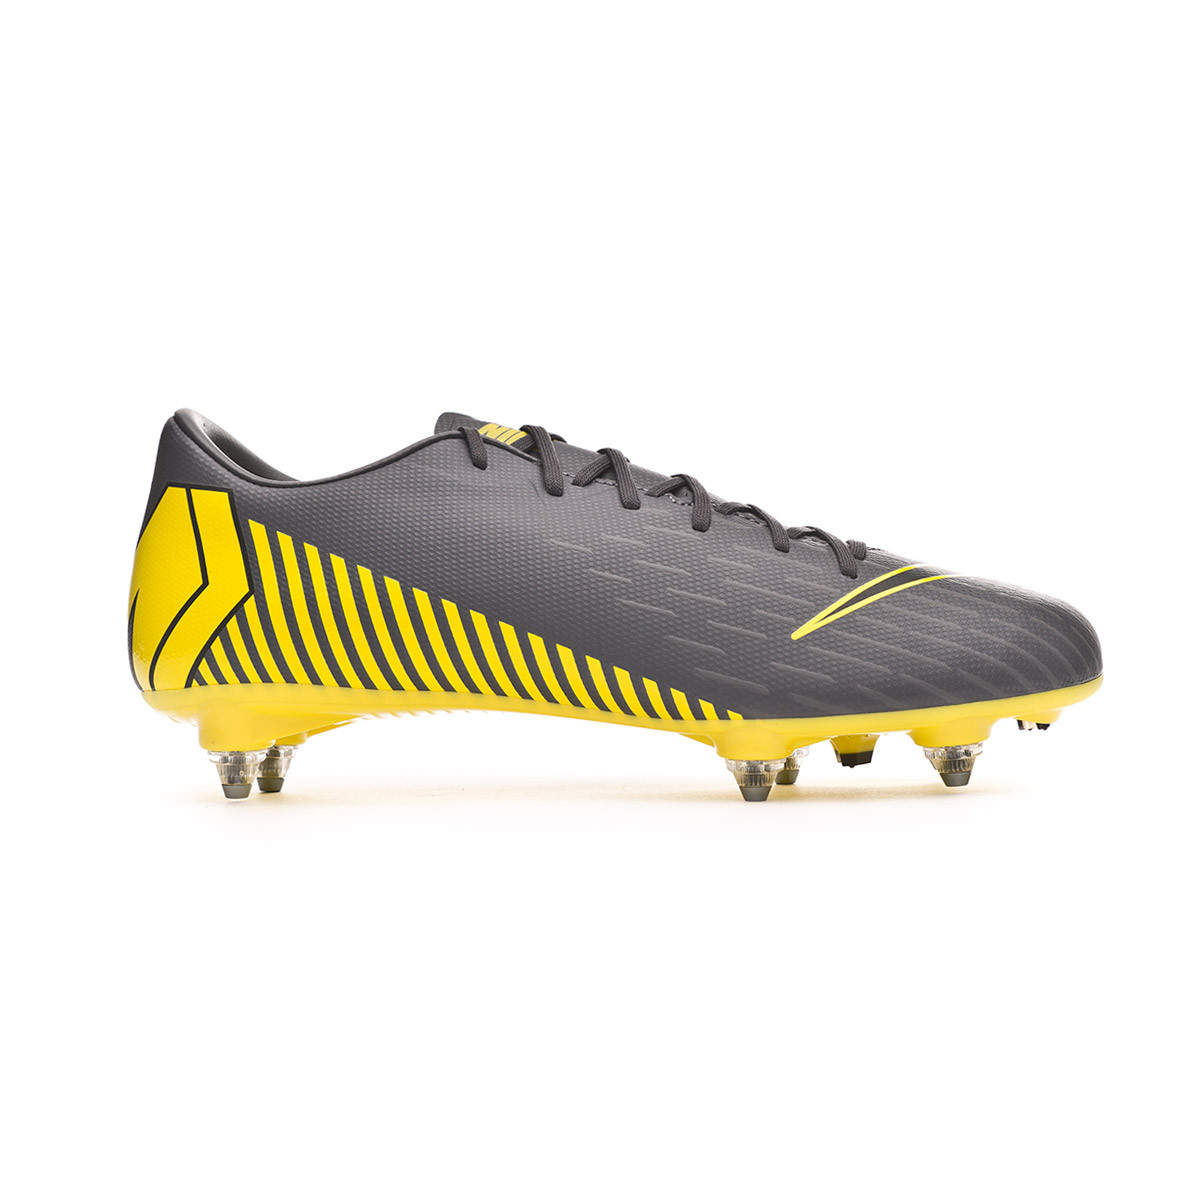 674631978 Football Boots Nike Mercurial Vapor XII Academy SG-Pro Dark grey-Black -  Football store Fútbol Emotion